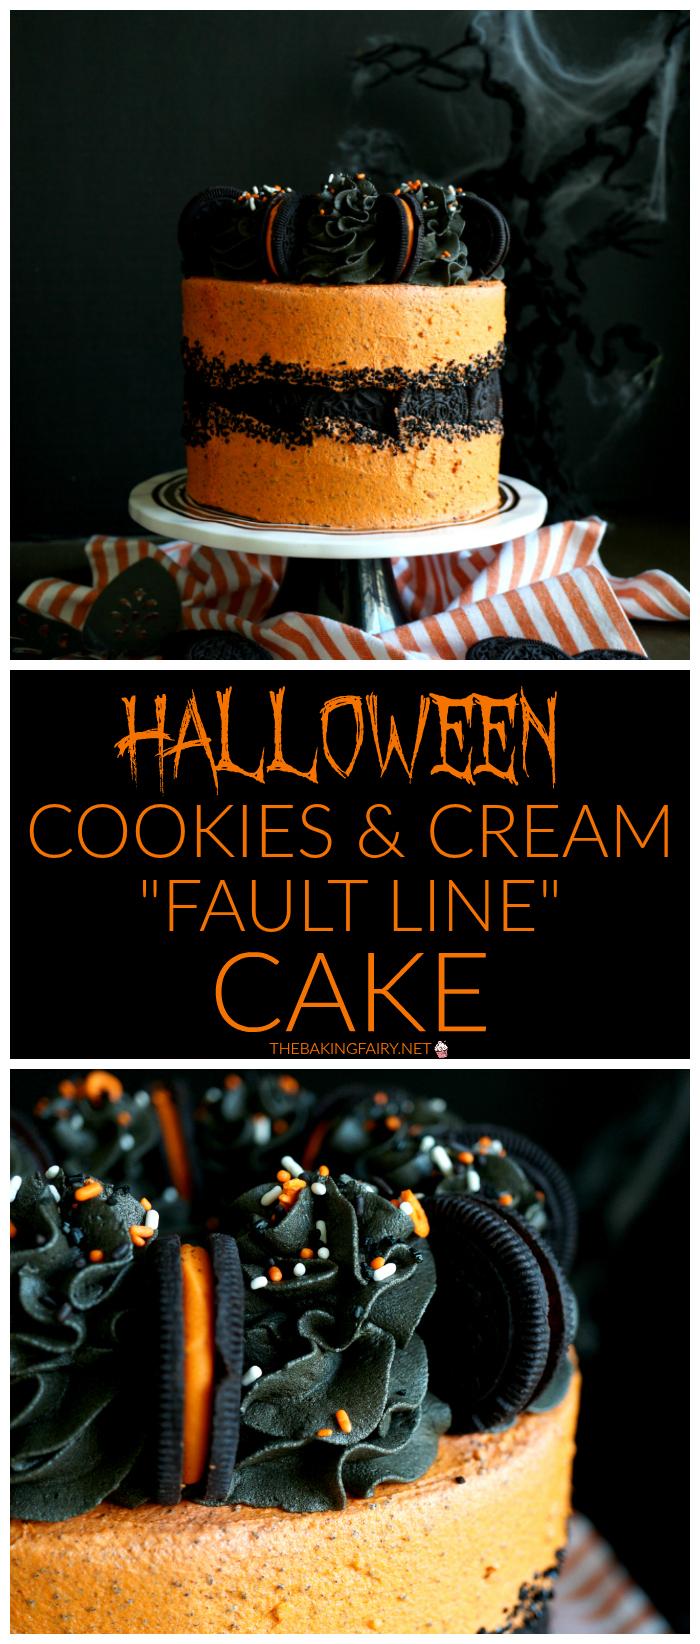 vegan Halloween cookies & cream fault line cake | The Baking Fairy #HalloweenTreatsWeek #ad